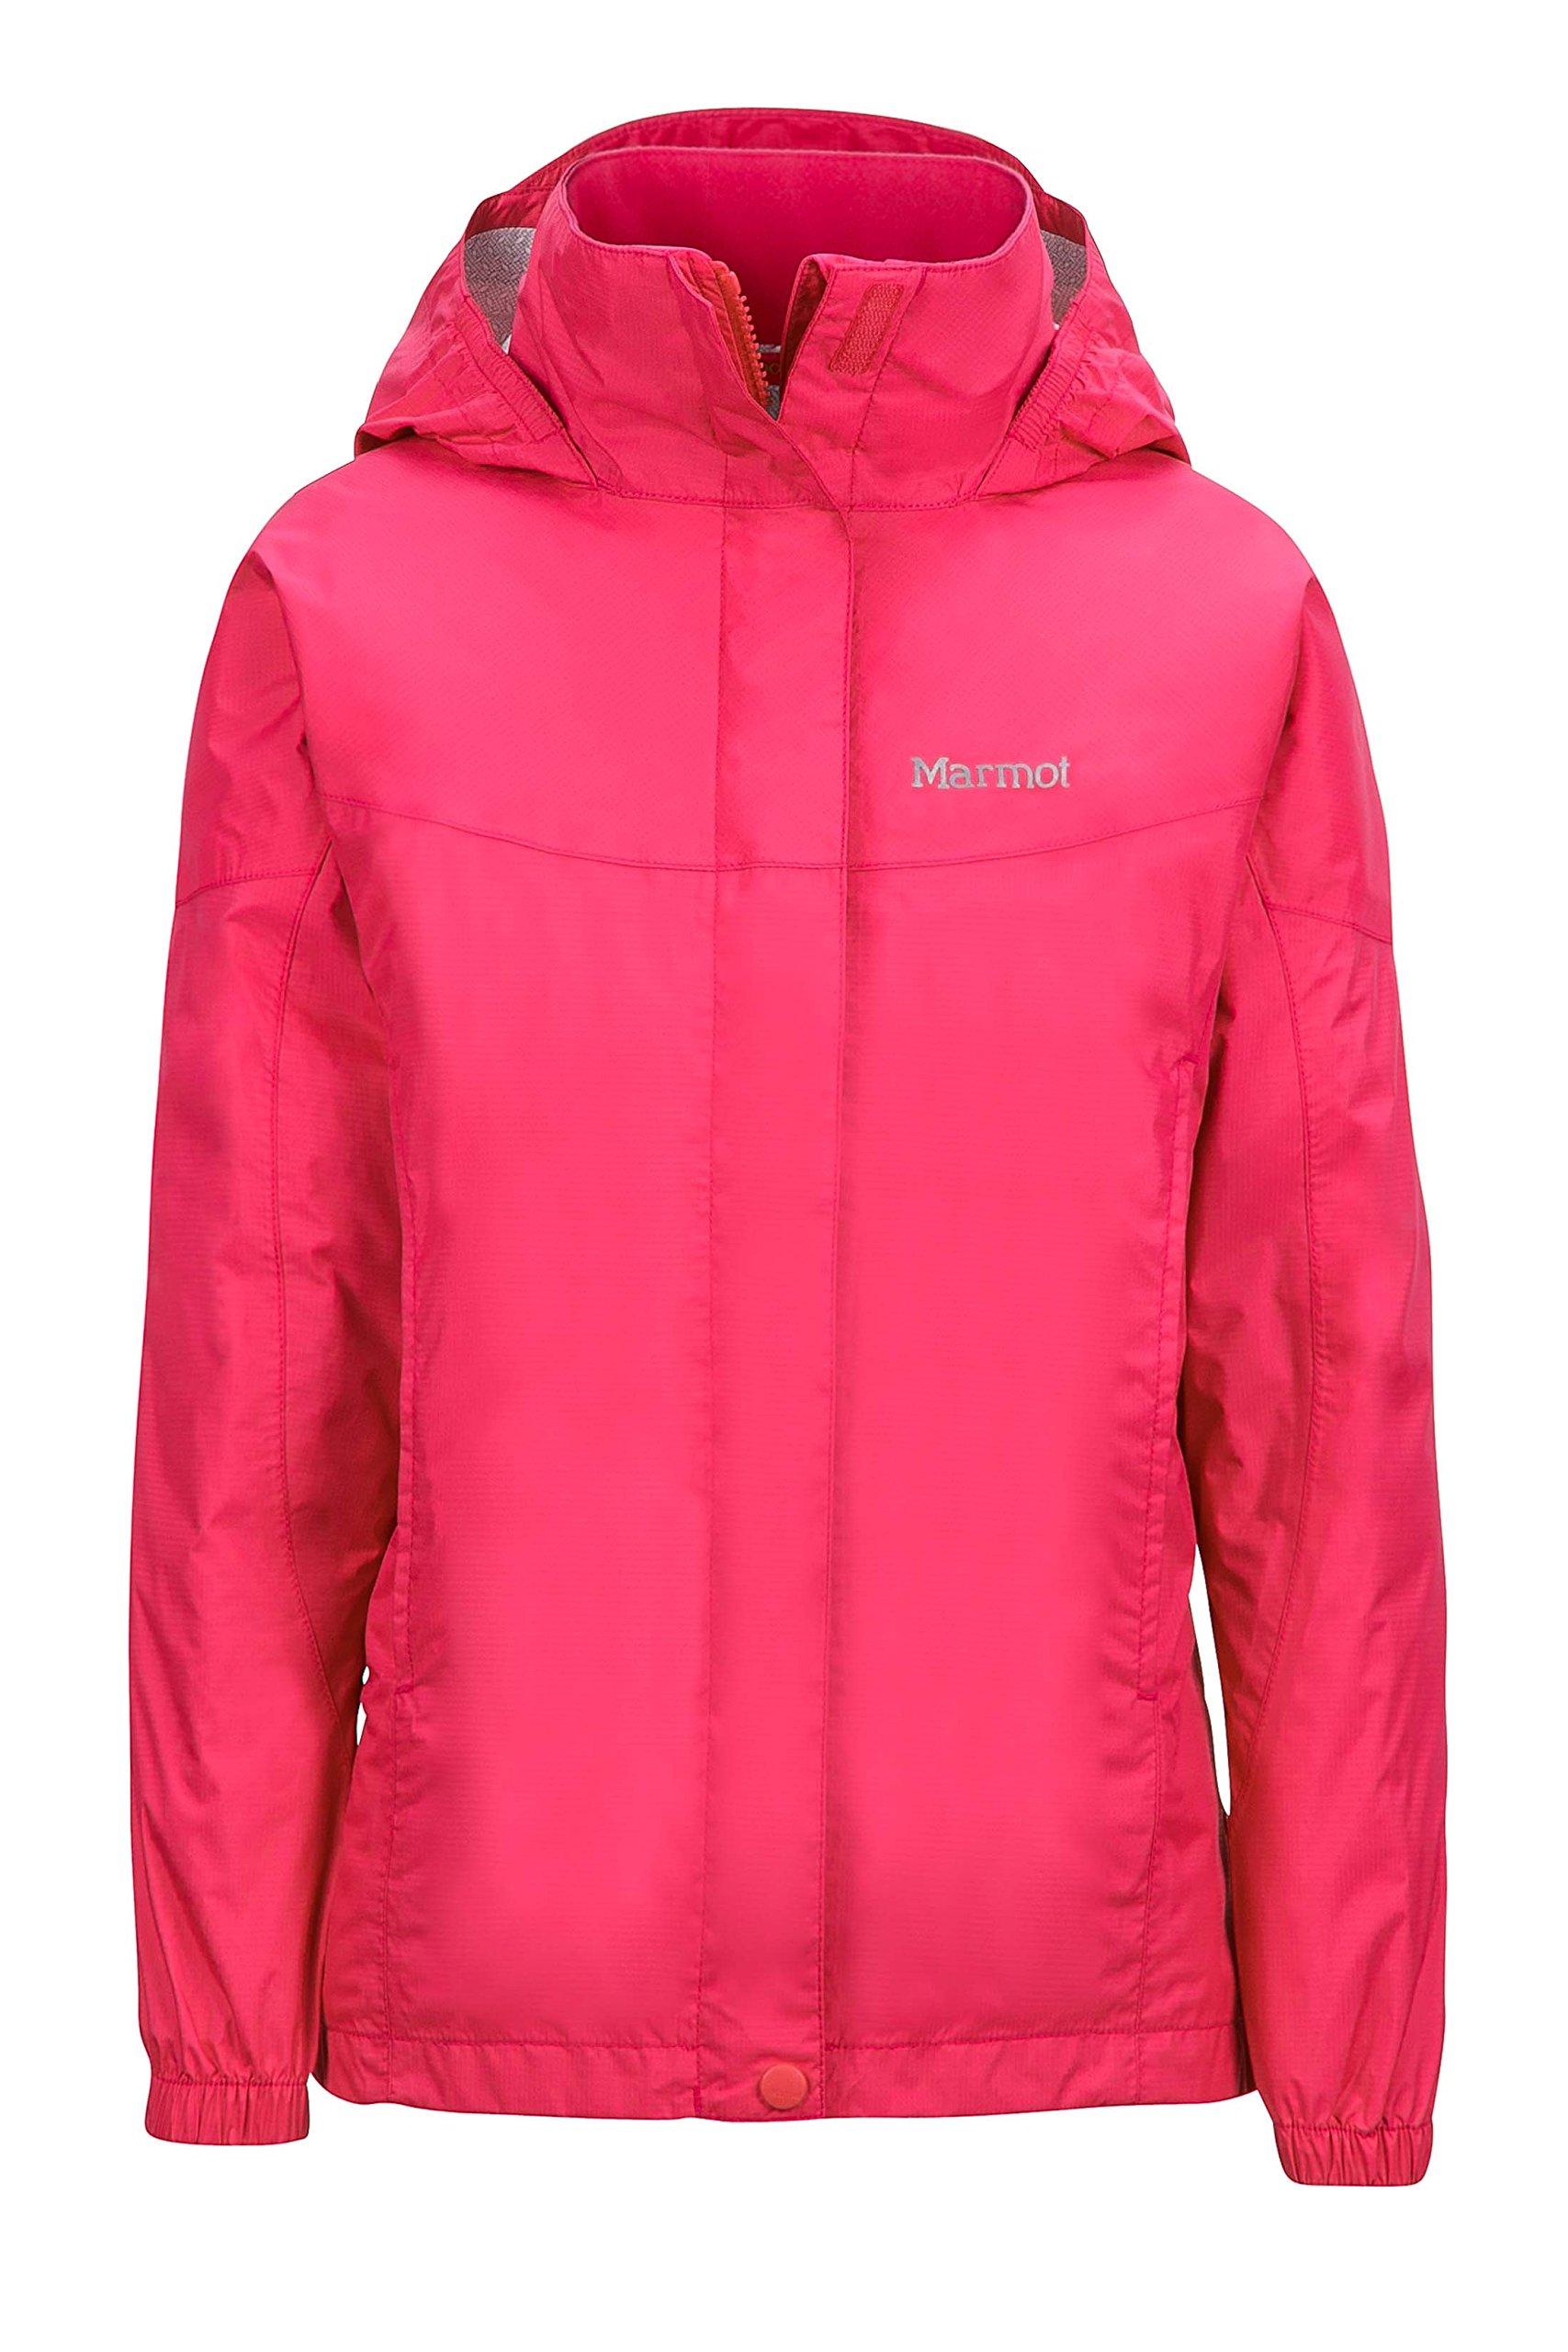 Marmot PreCip Girls' Lightweight Waterproof Rain Jacket, Pink Rock, Small